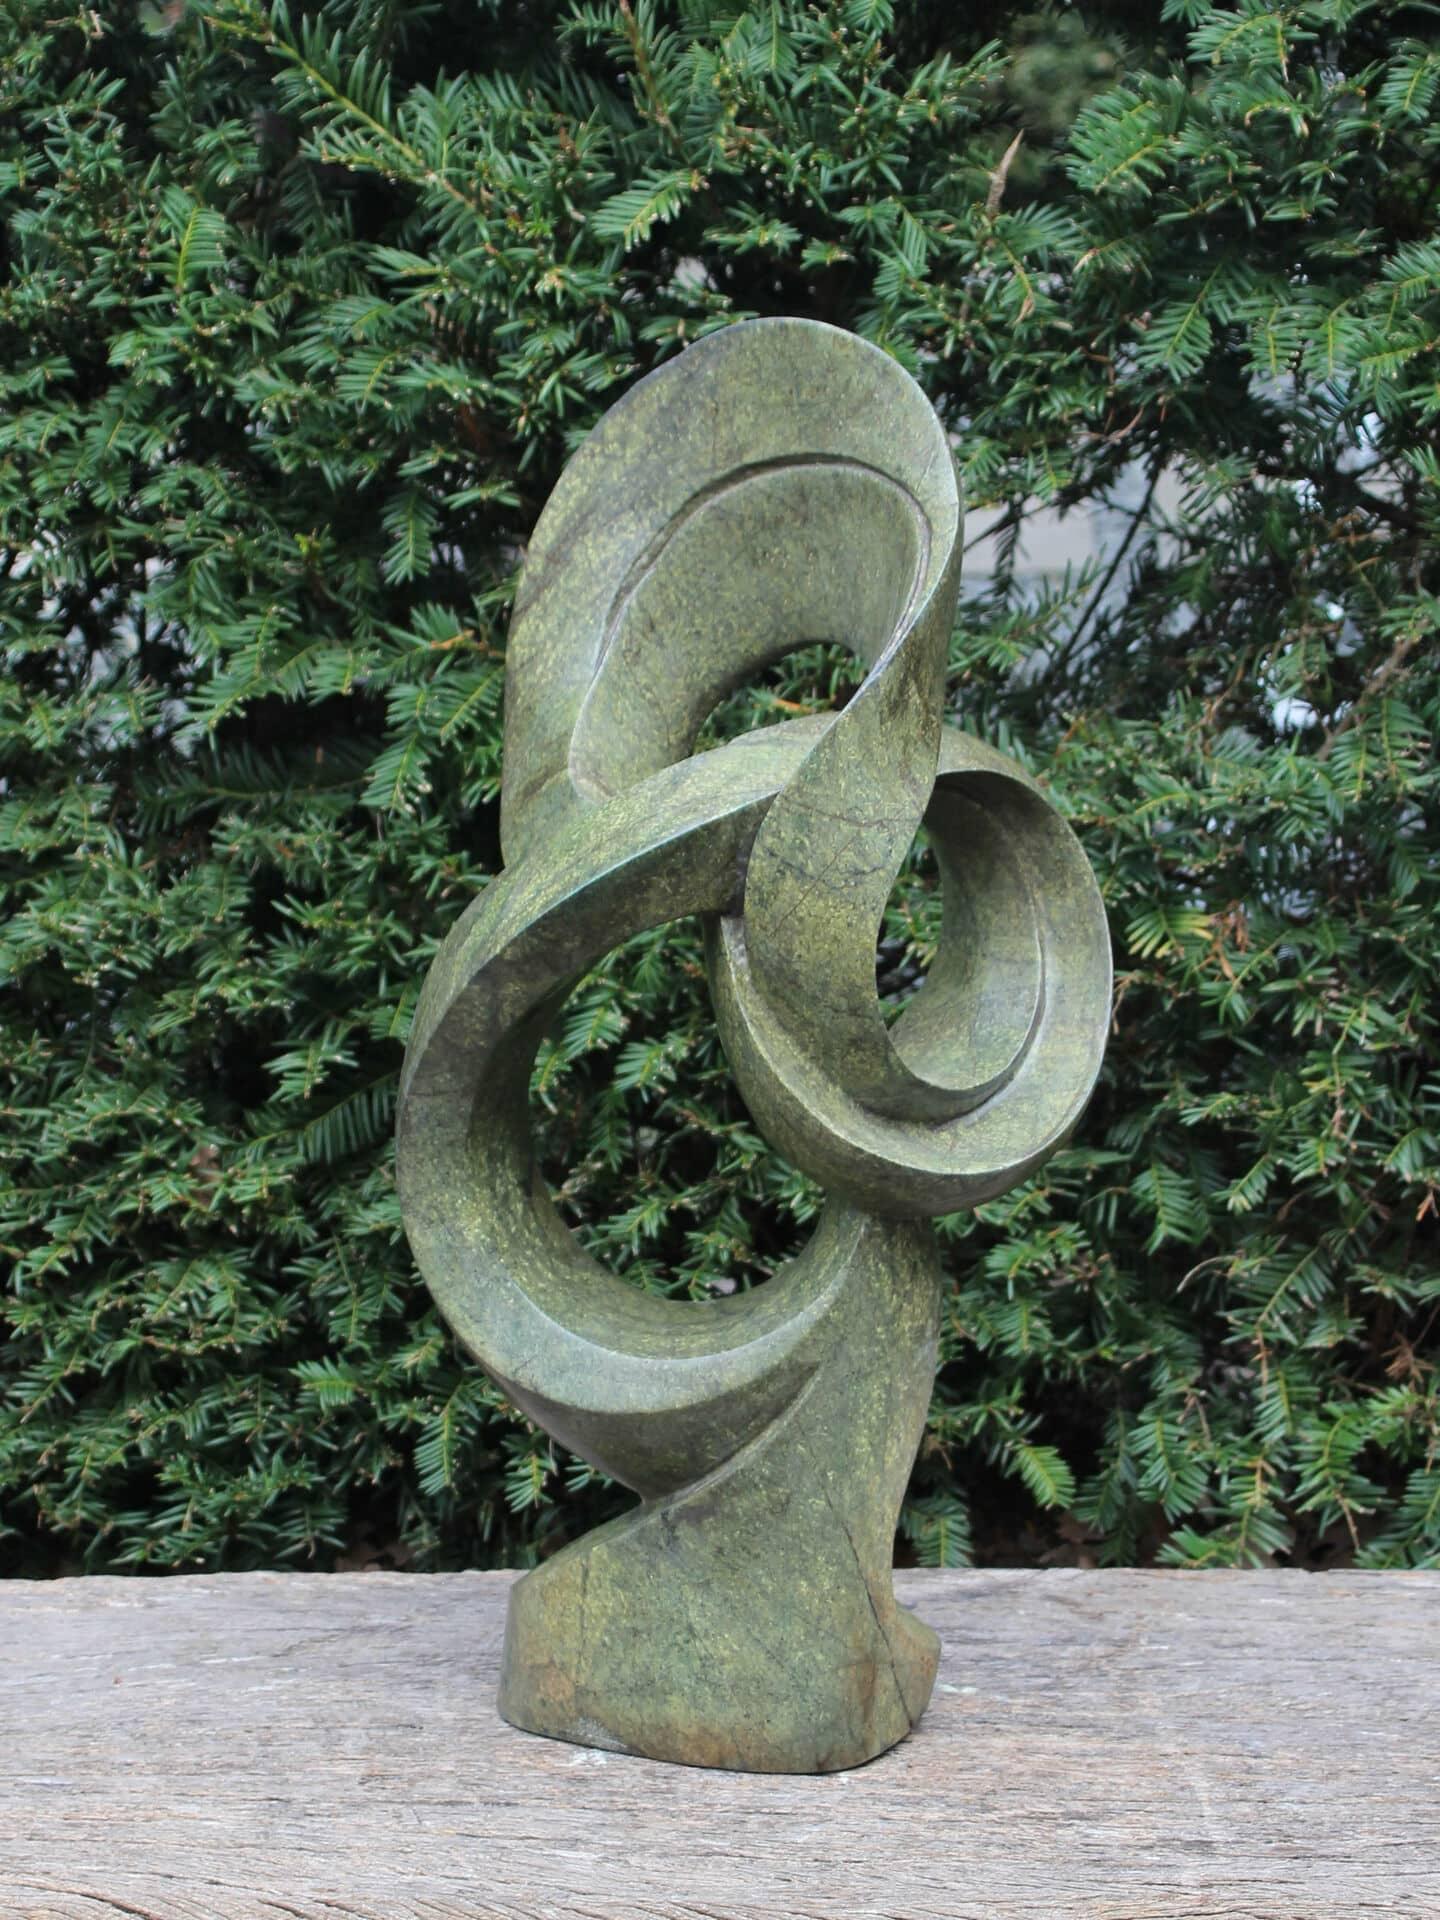 Tuin sculptuur Glorious 58 cm, cheeta jade